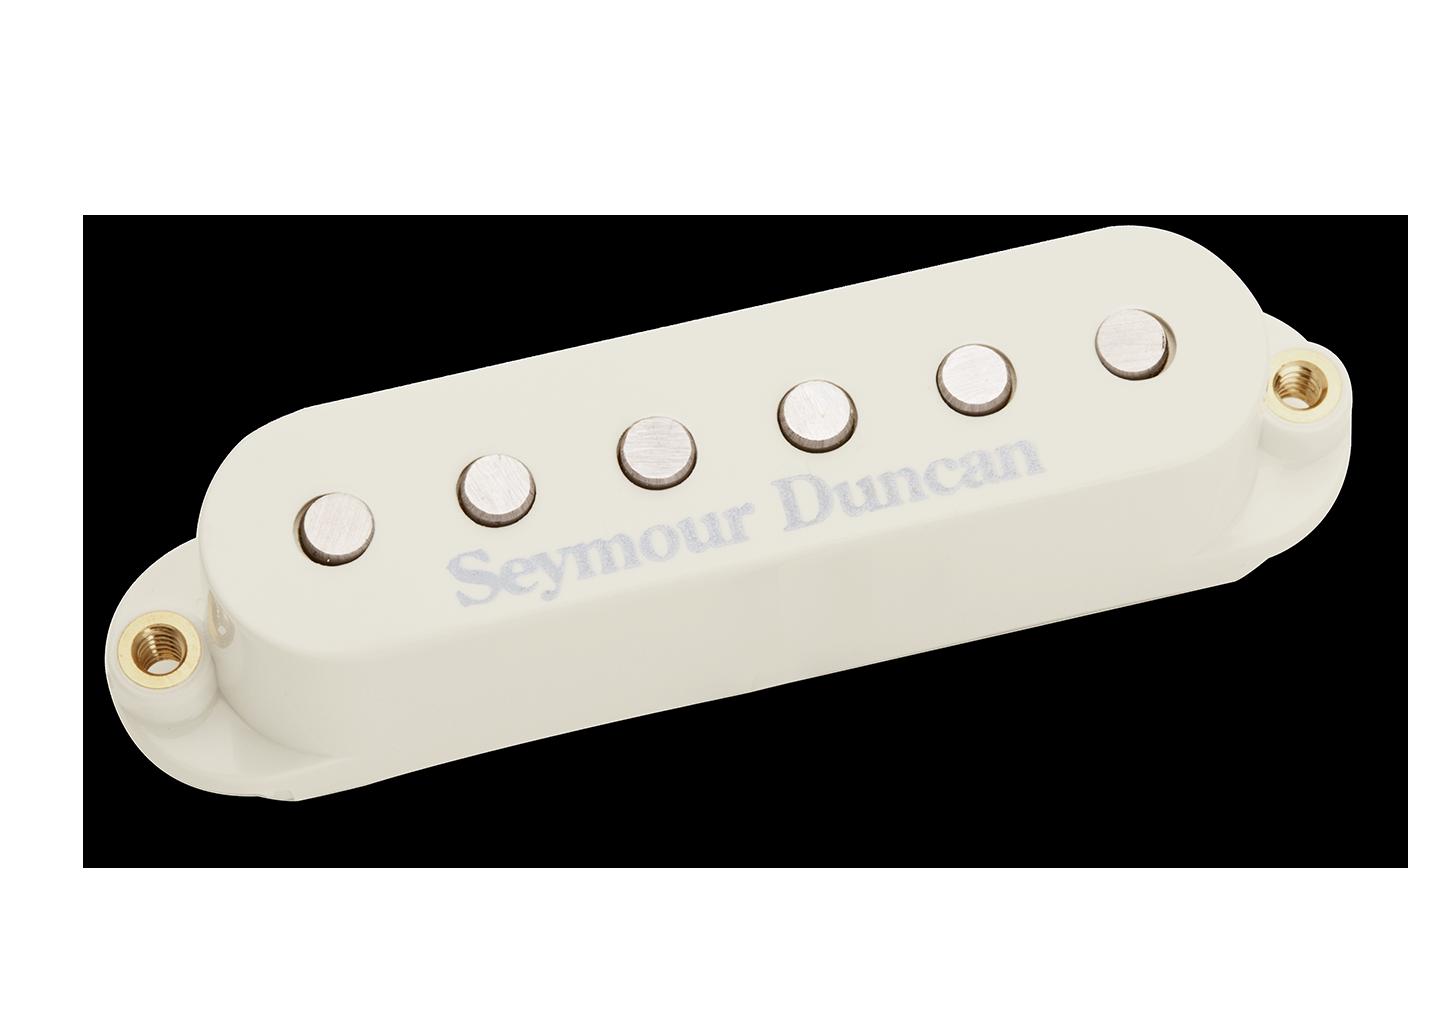 Seymour Duncan Custom Stack Plus Strat STK-S6 Parchment